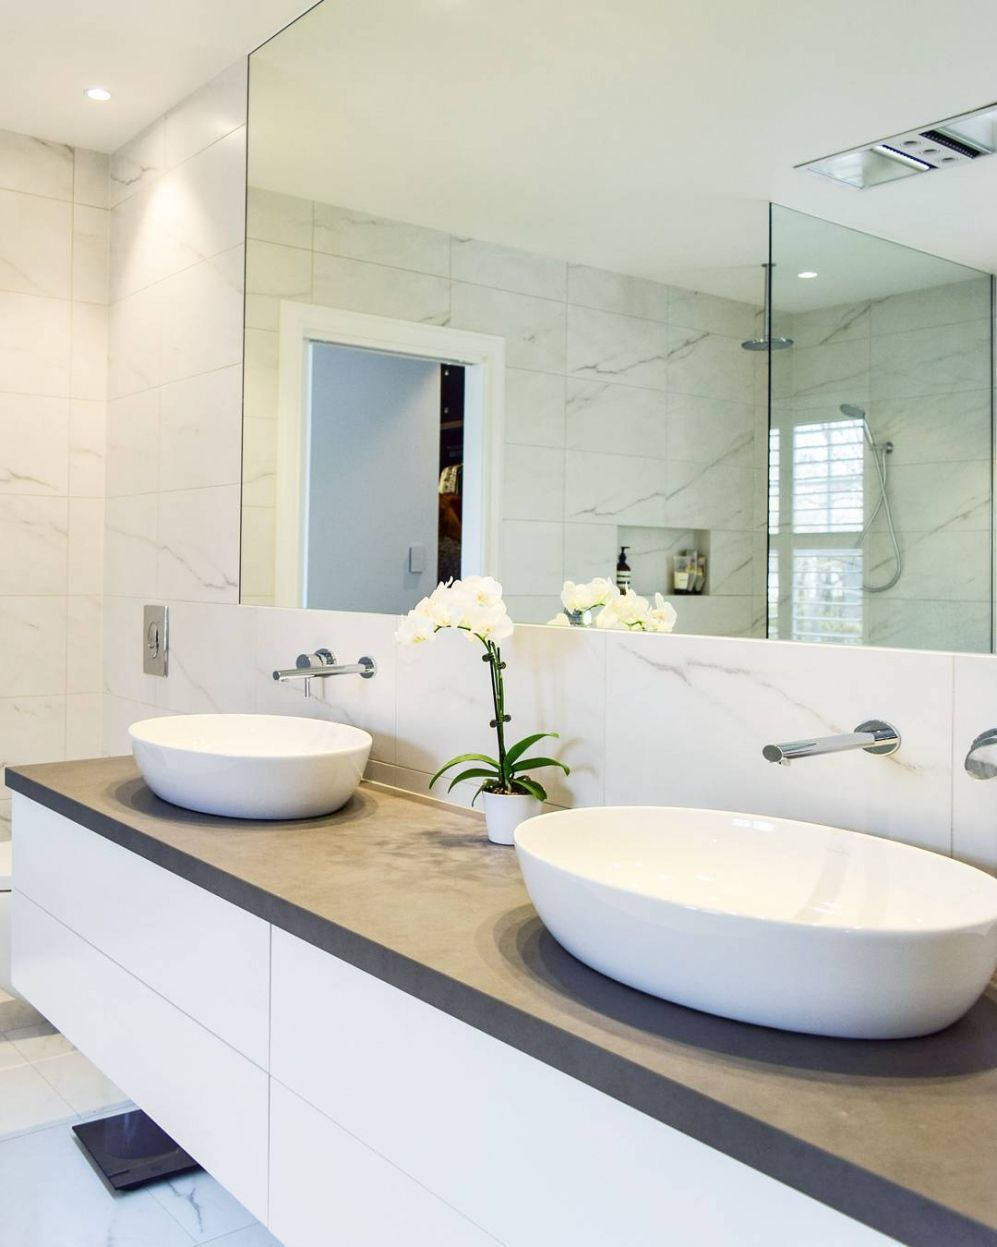 2019 bathroom renovation order of work best interior paint brands